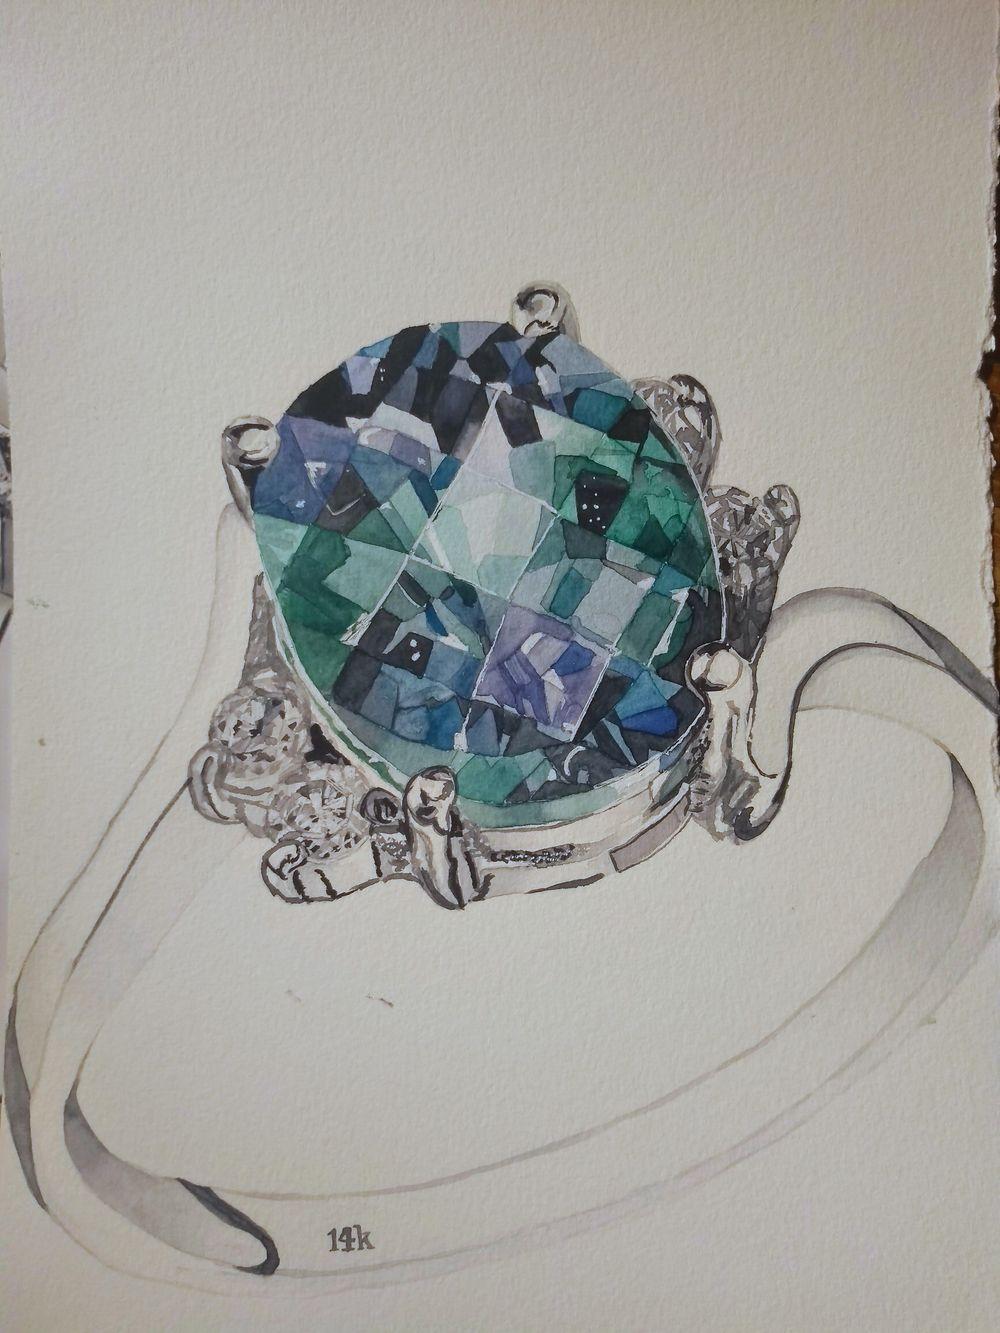 Gemstone - image 2 - student project